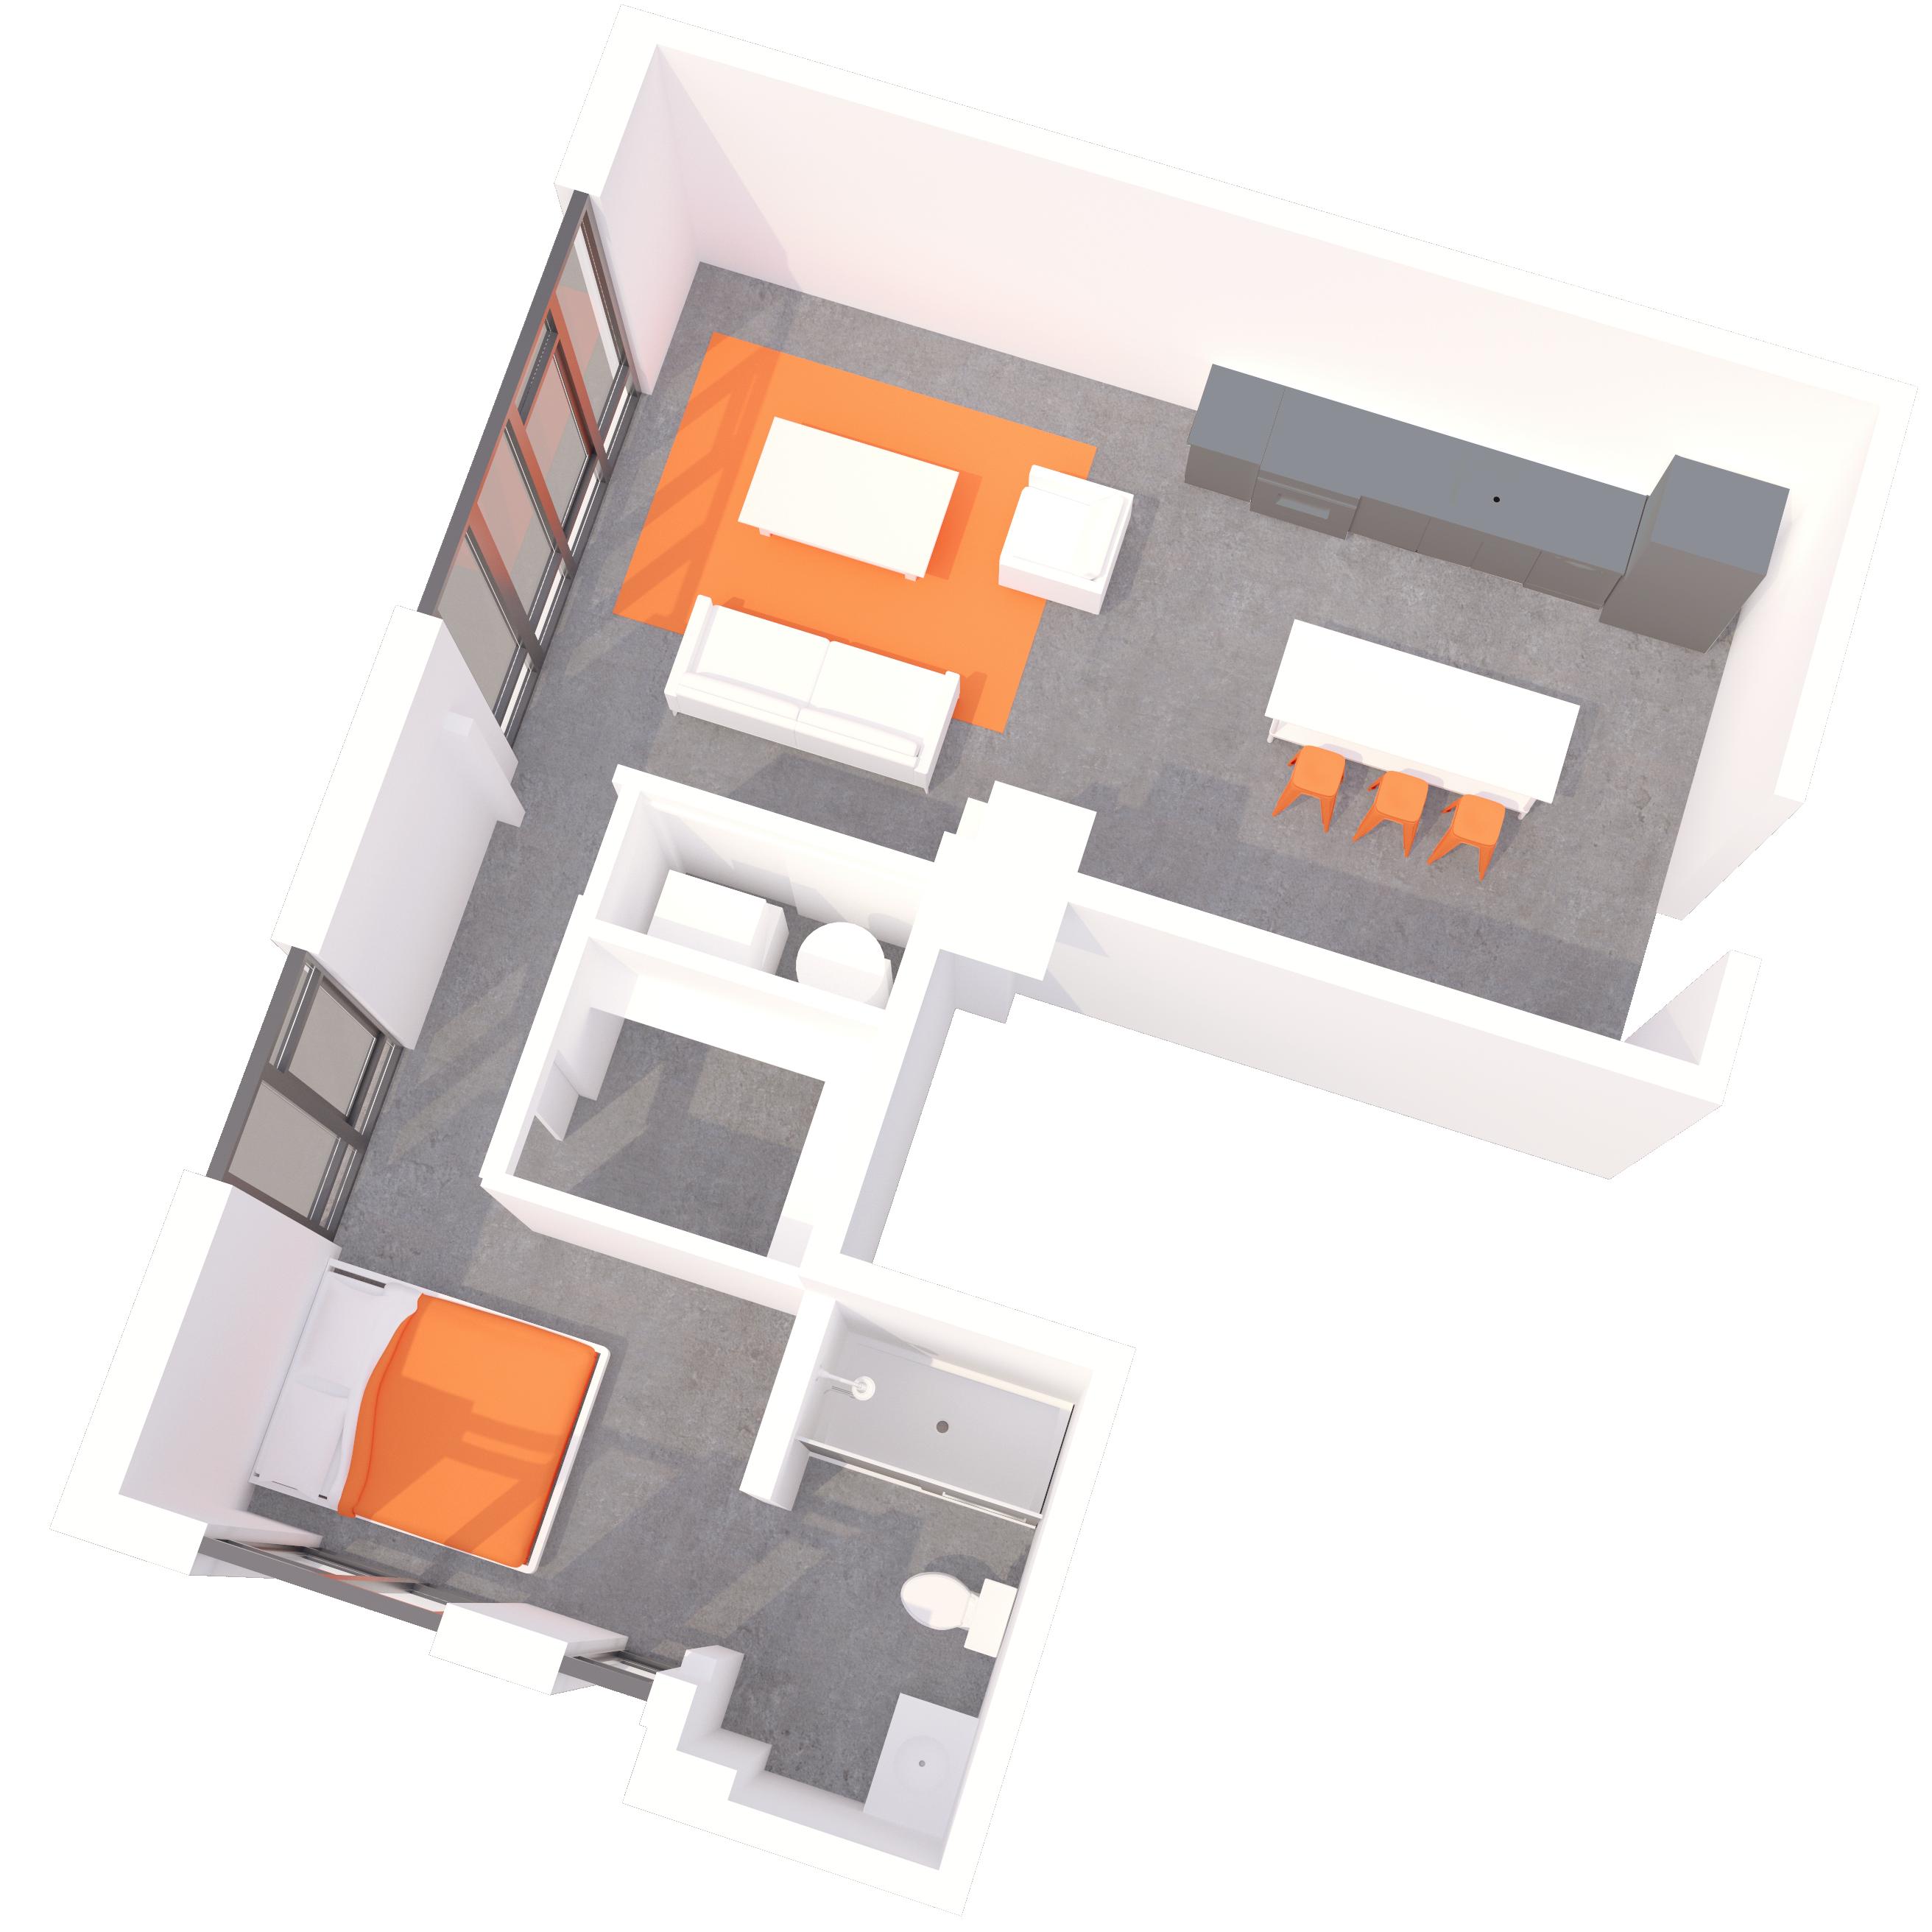 1 BR Floorplan C